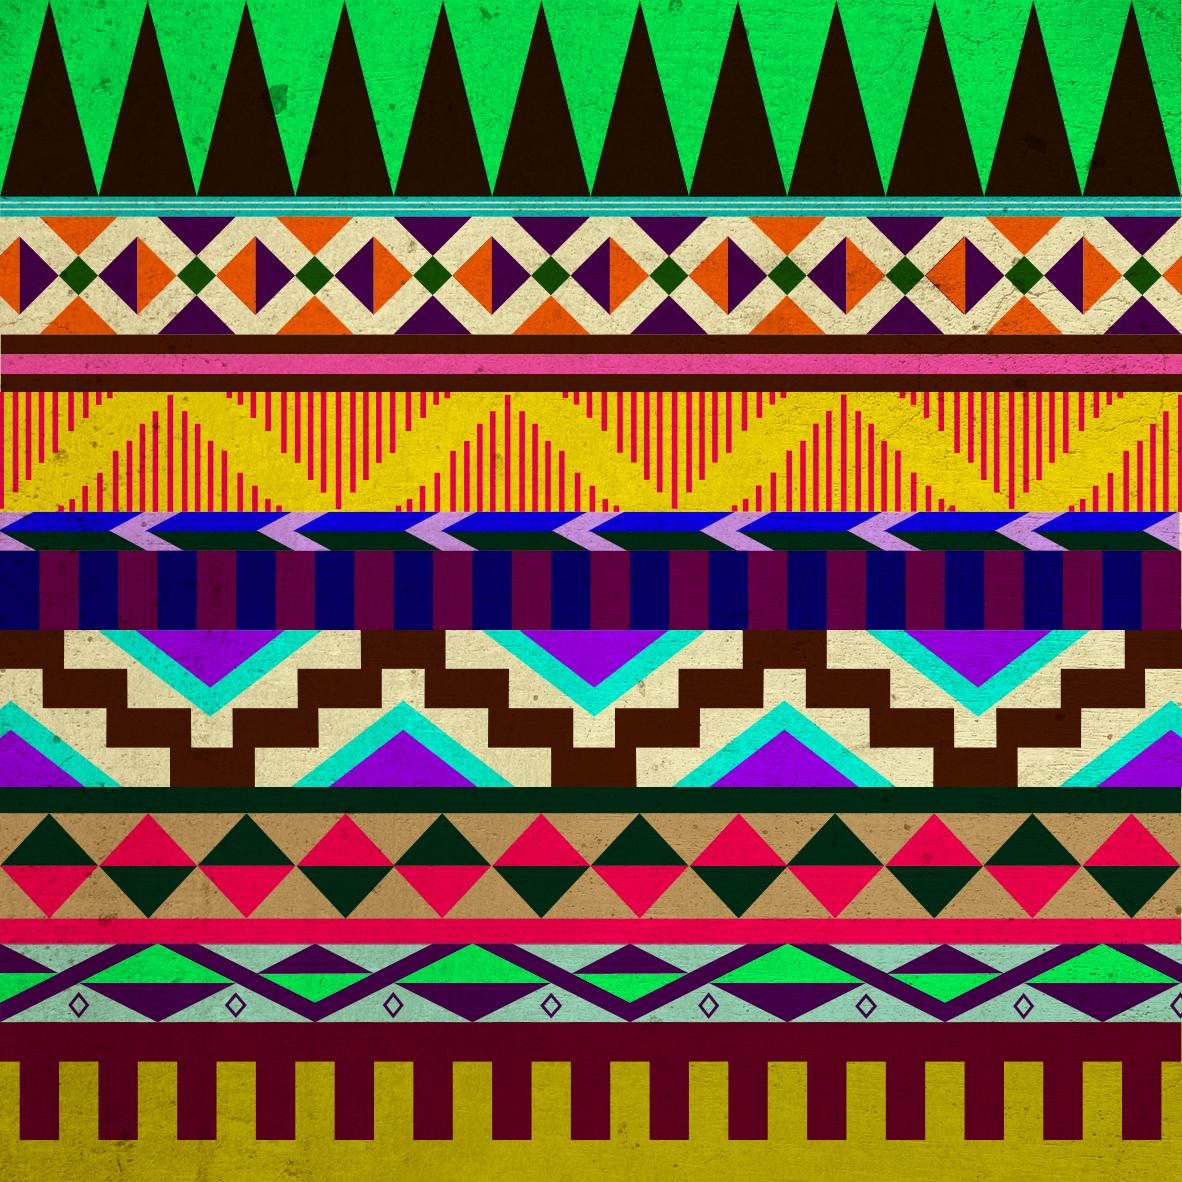 street style fashion aztec patterns in fashion